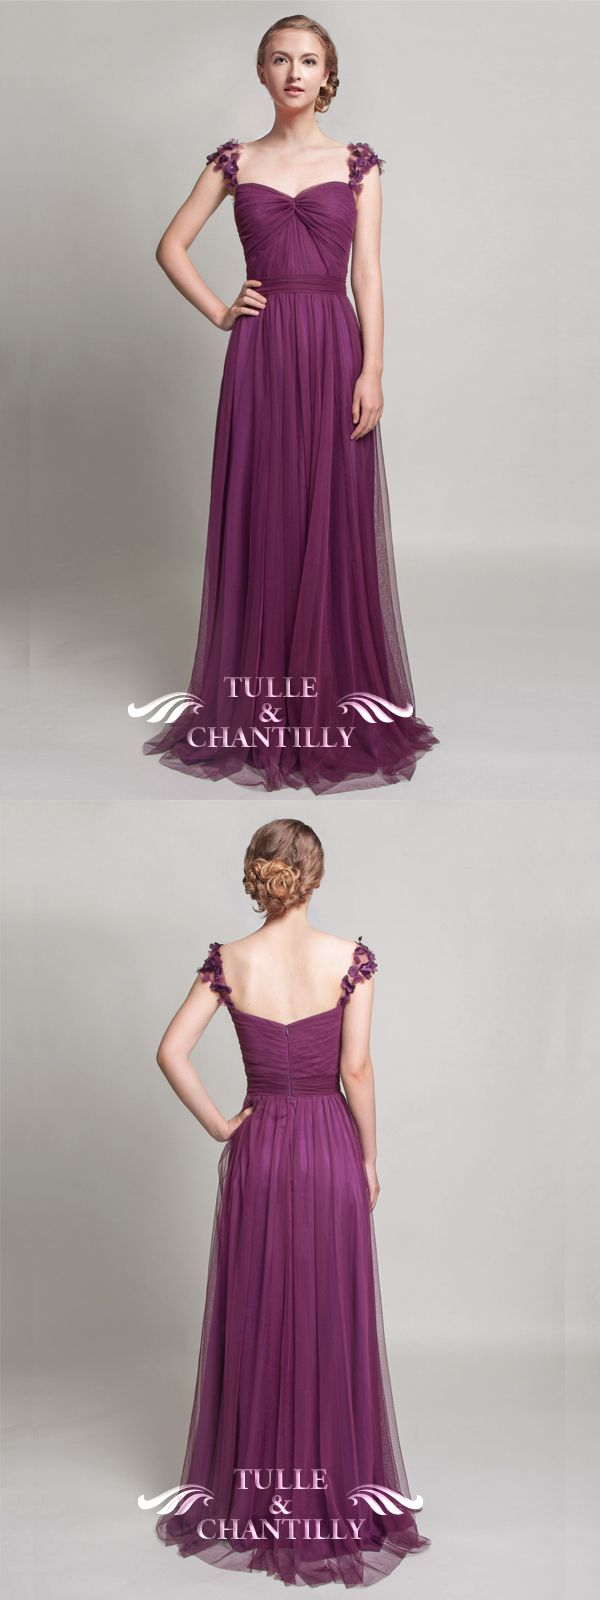 best wedding images on pinterest wedding ideas floral